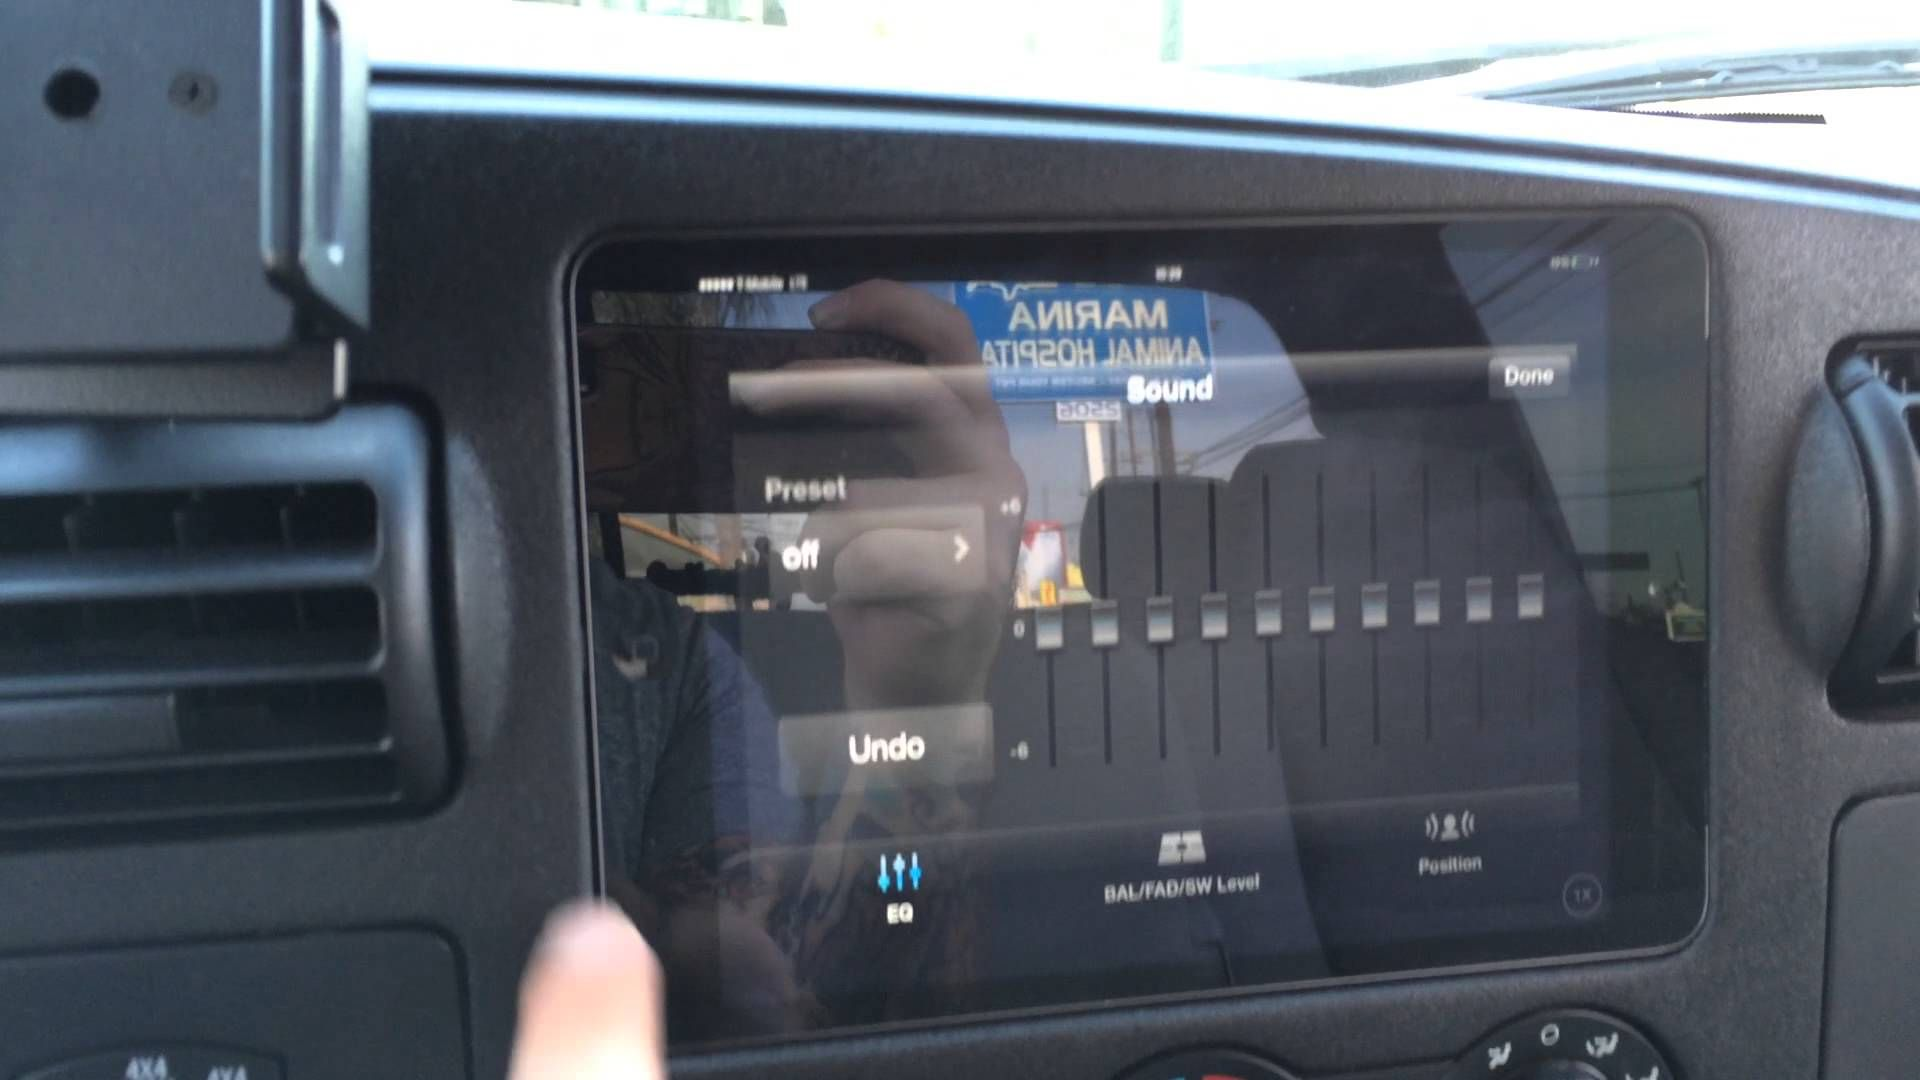 Ford F250 Ipad Mini Slider Kit Installation Sony Radio App Control Soundmanca Official Installer Sony Radio Ipad Mini Mini Sliders